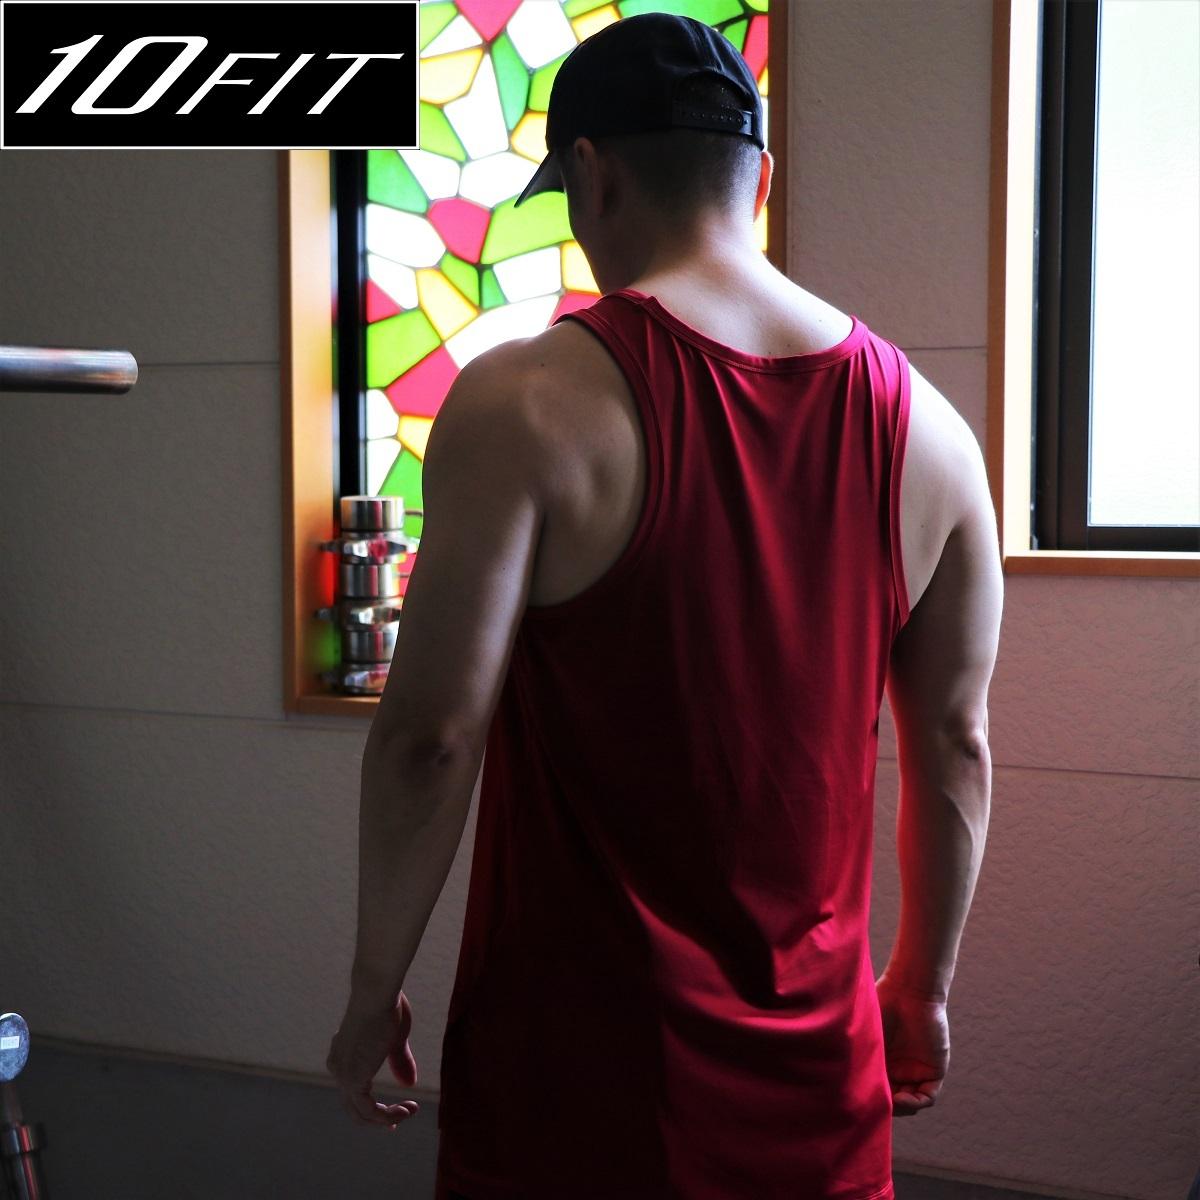 10FIT タンクトップ トレーニング 筋トレ ボディビル メンズ TE-16 ワインレッド ロング丈